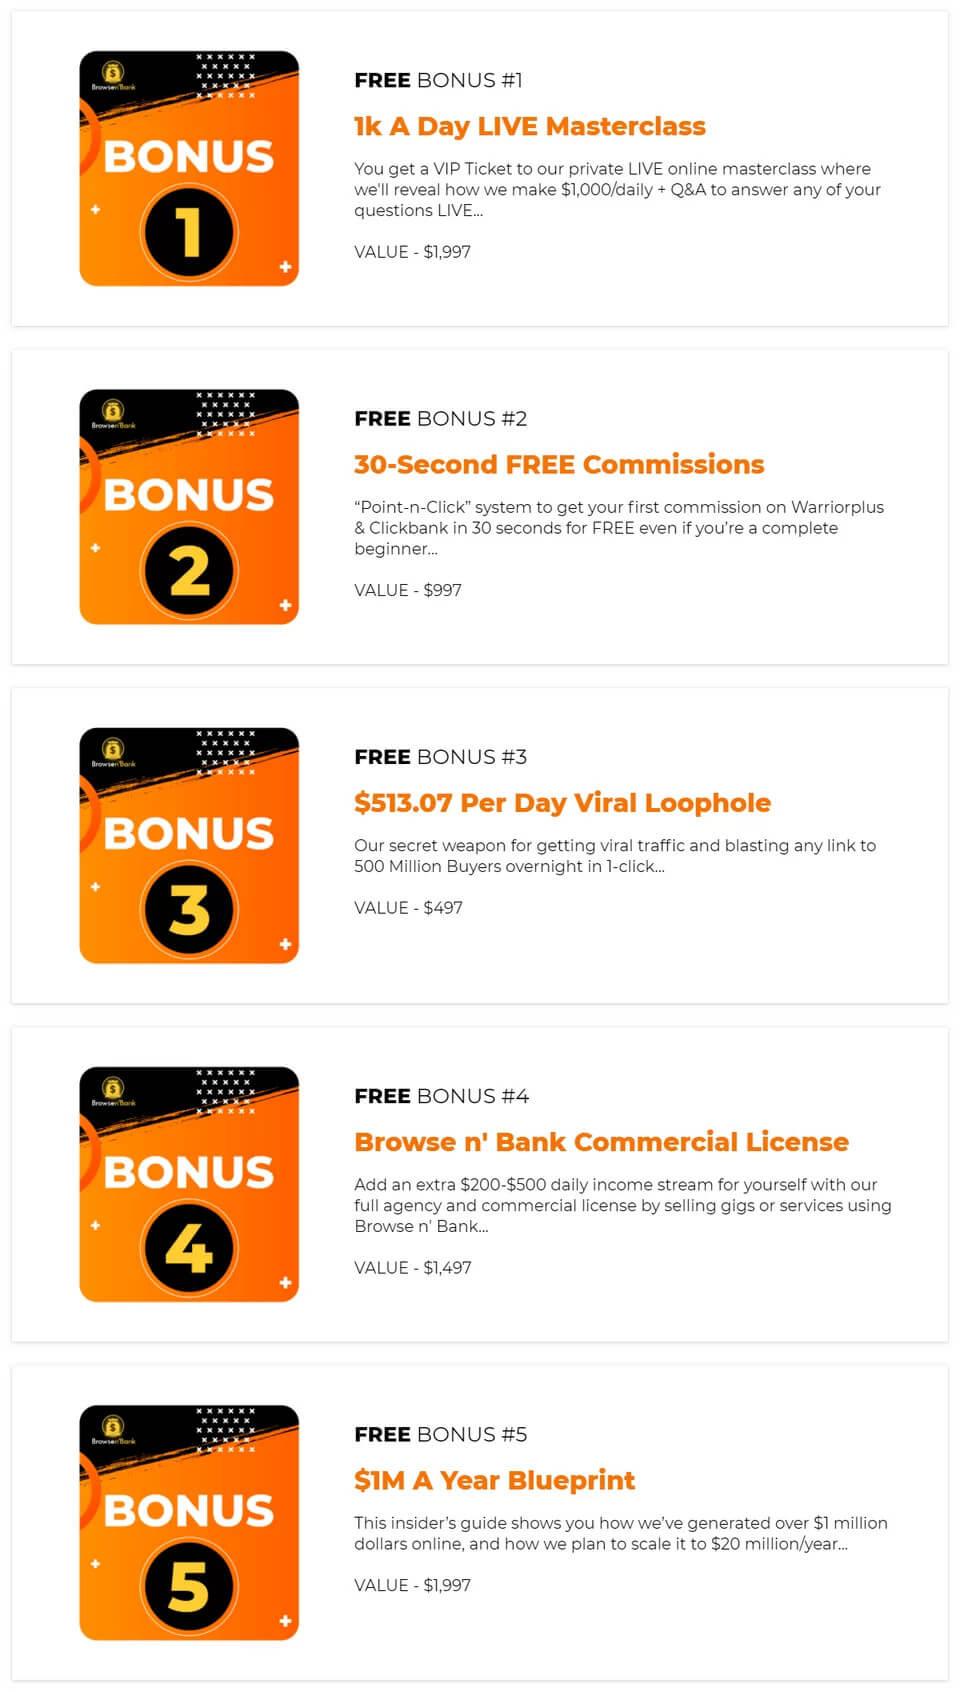 BrowsenBank-bonus